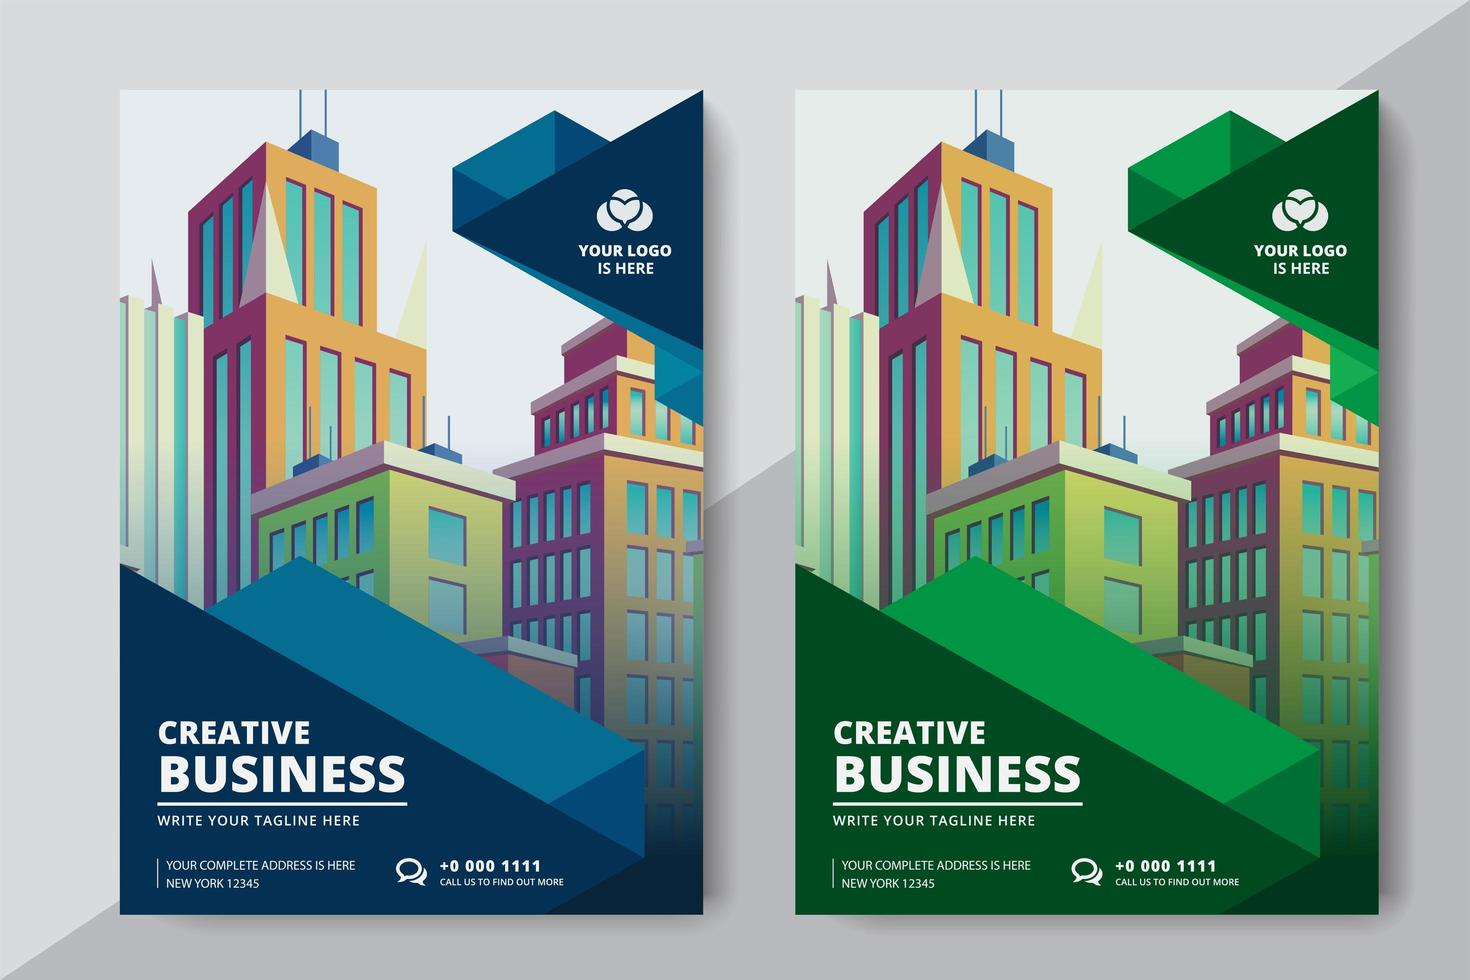 Business Flyer A4 Size 2 Flyers Colore verde e blu vettore